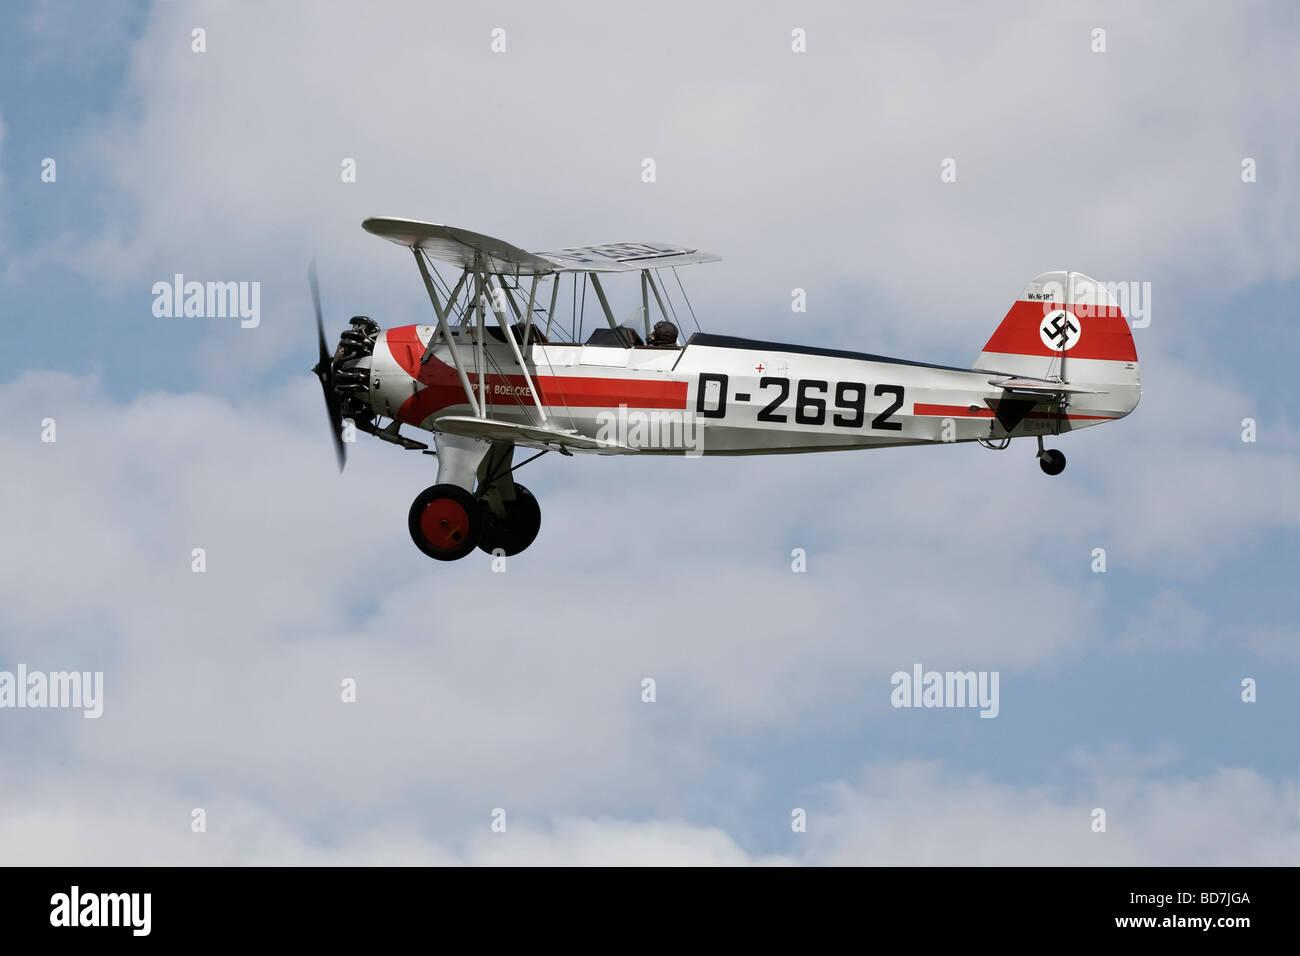 A Focke Wulf Fw44 Stieglitz training aircraft of the Luftwaffe - Stock Image